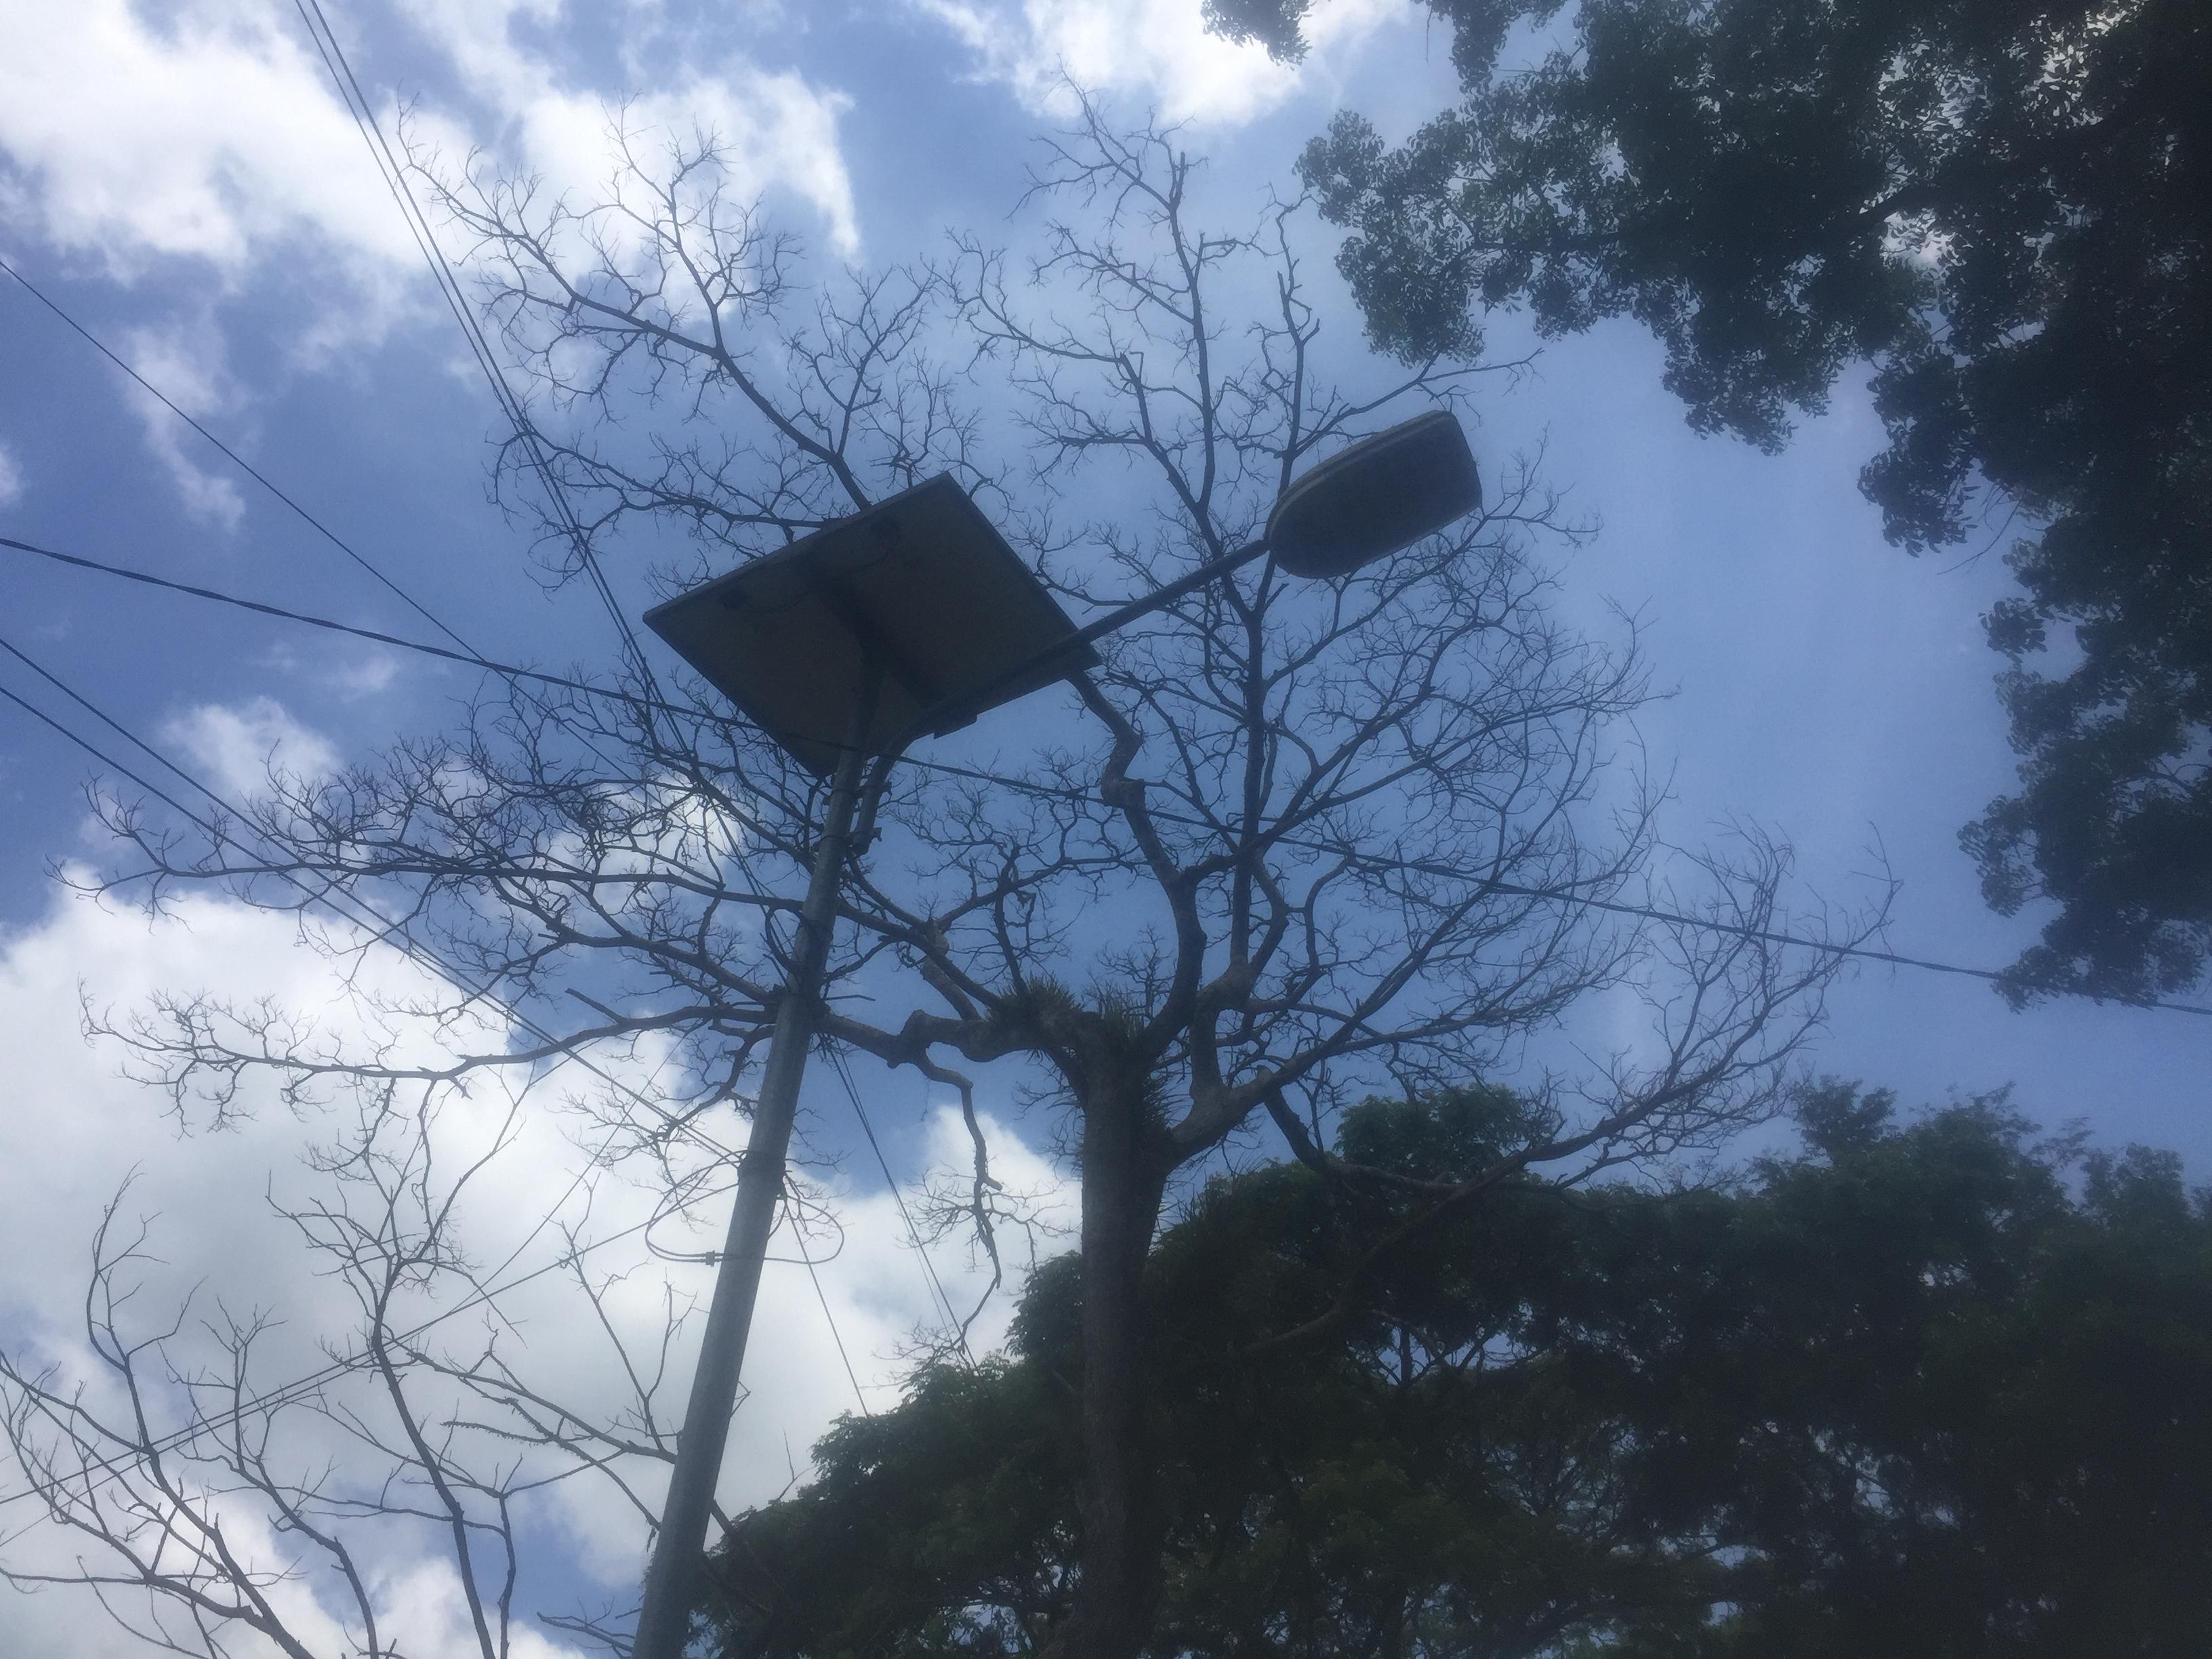 8 Solar Cell Lampu PJU Raib Di Ambil Pencuri, Di Jalan Purwoharjo Banyuwangi